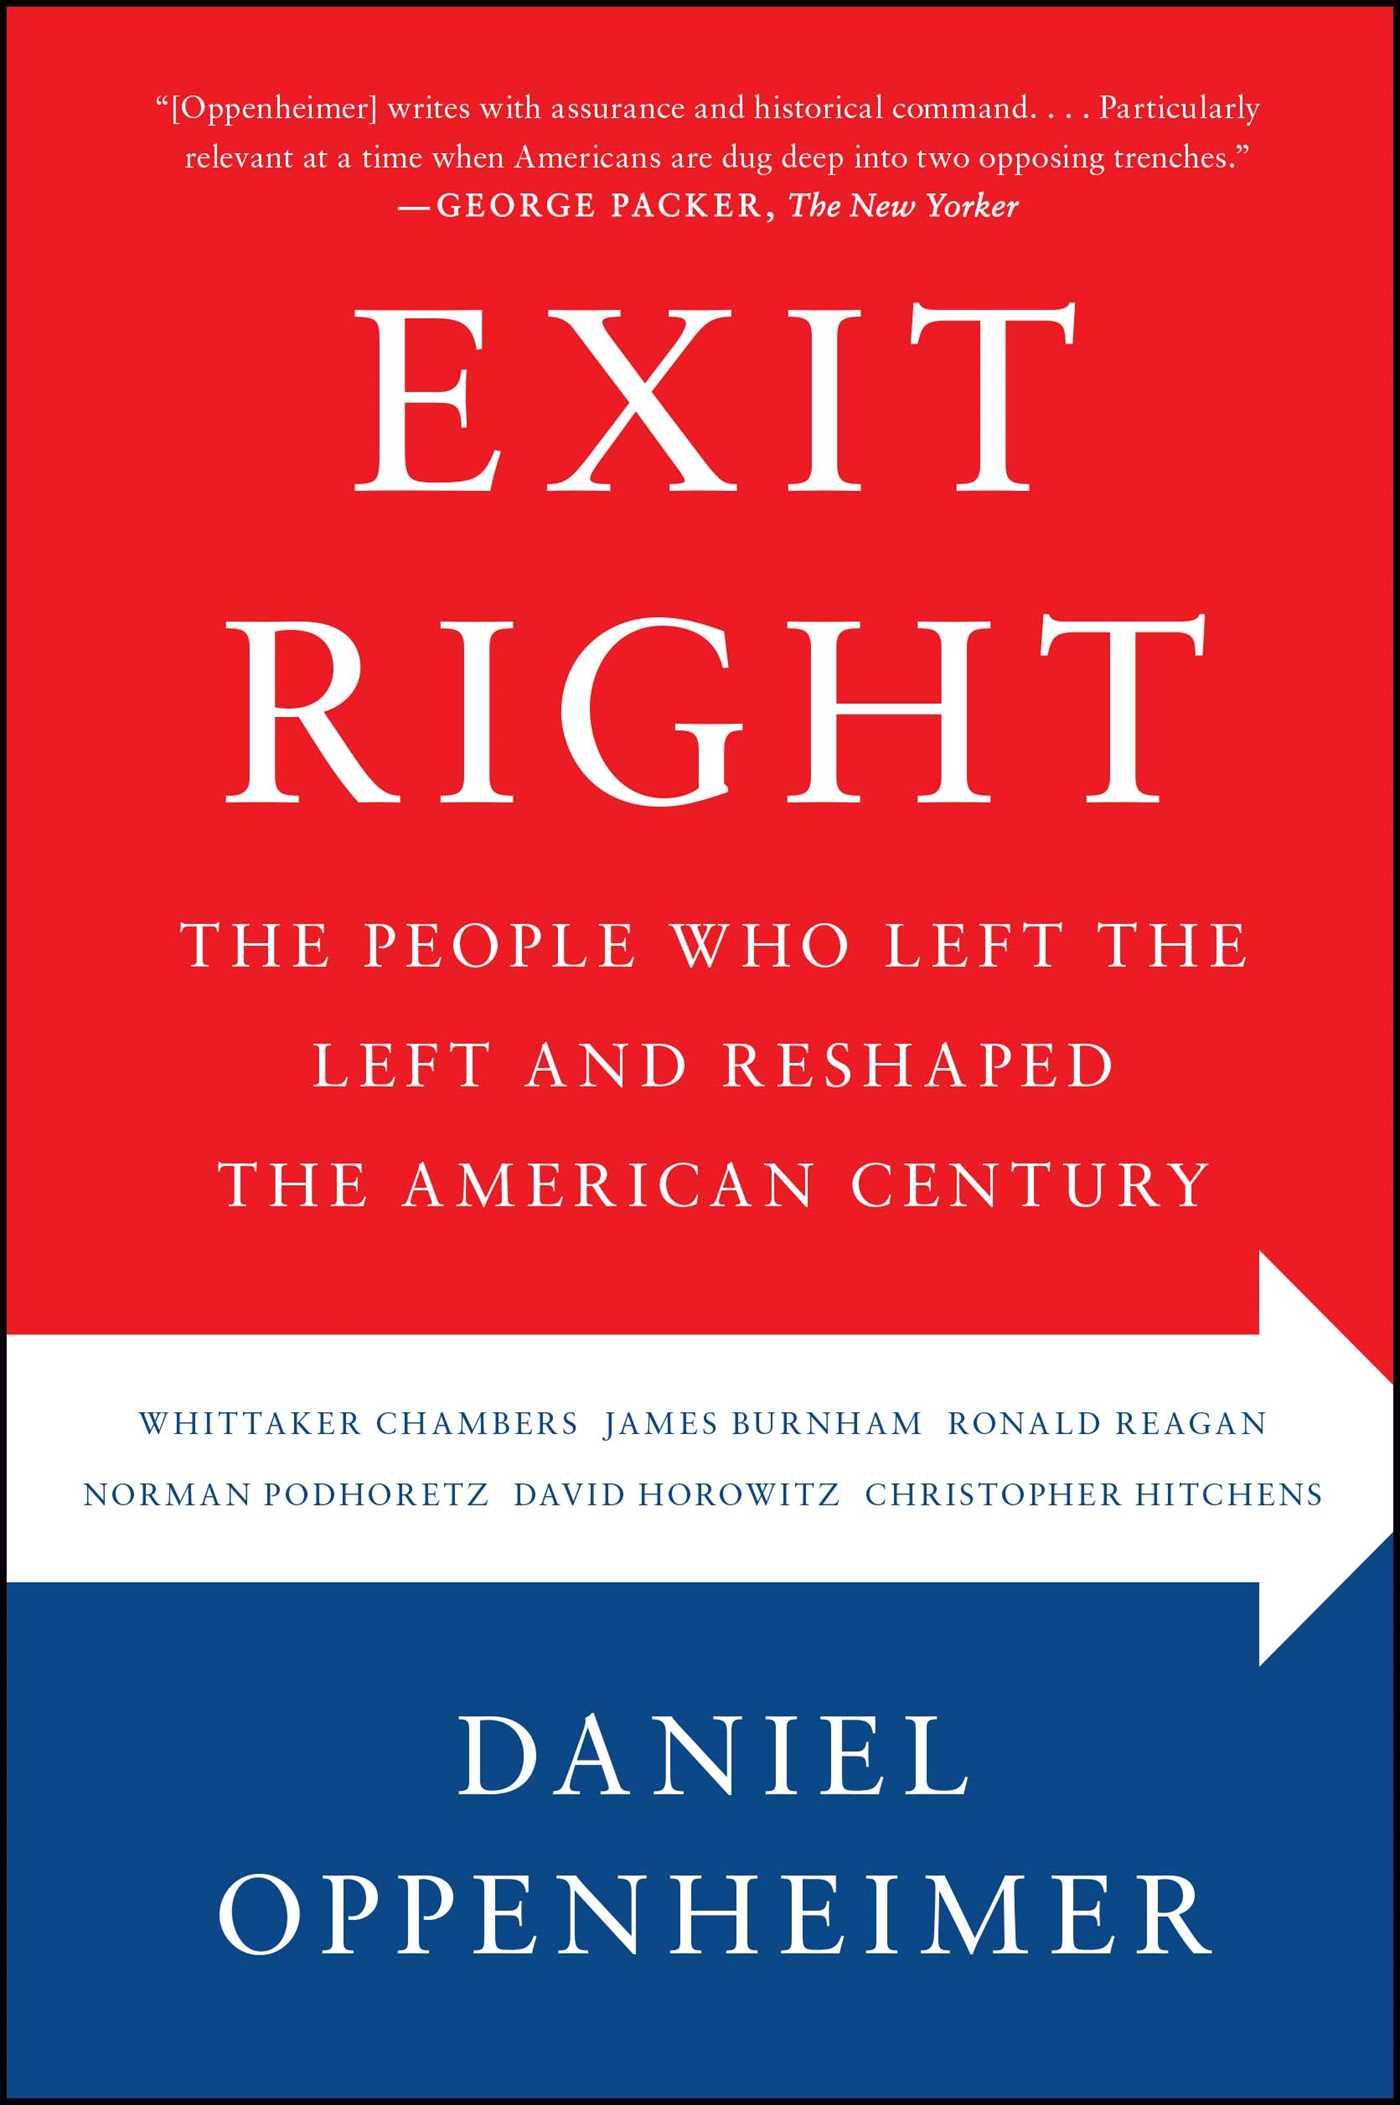 Exit right 9781416589716 hr